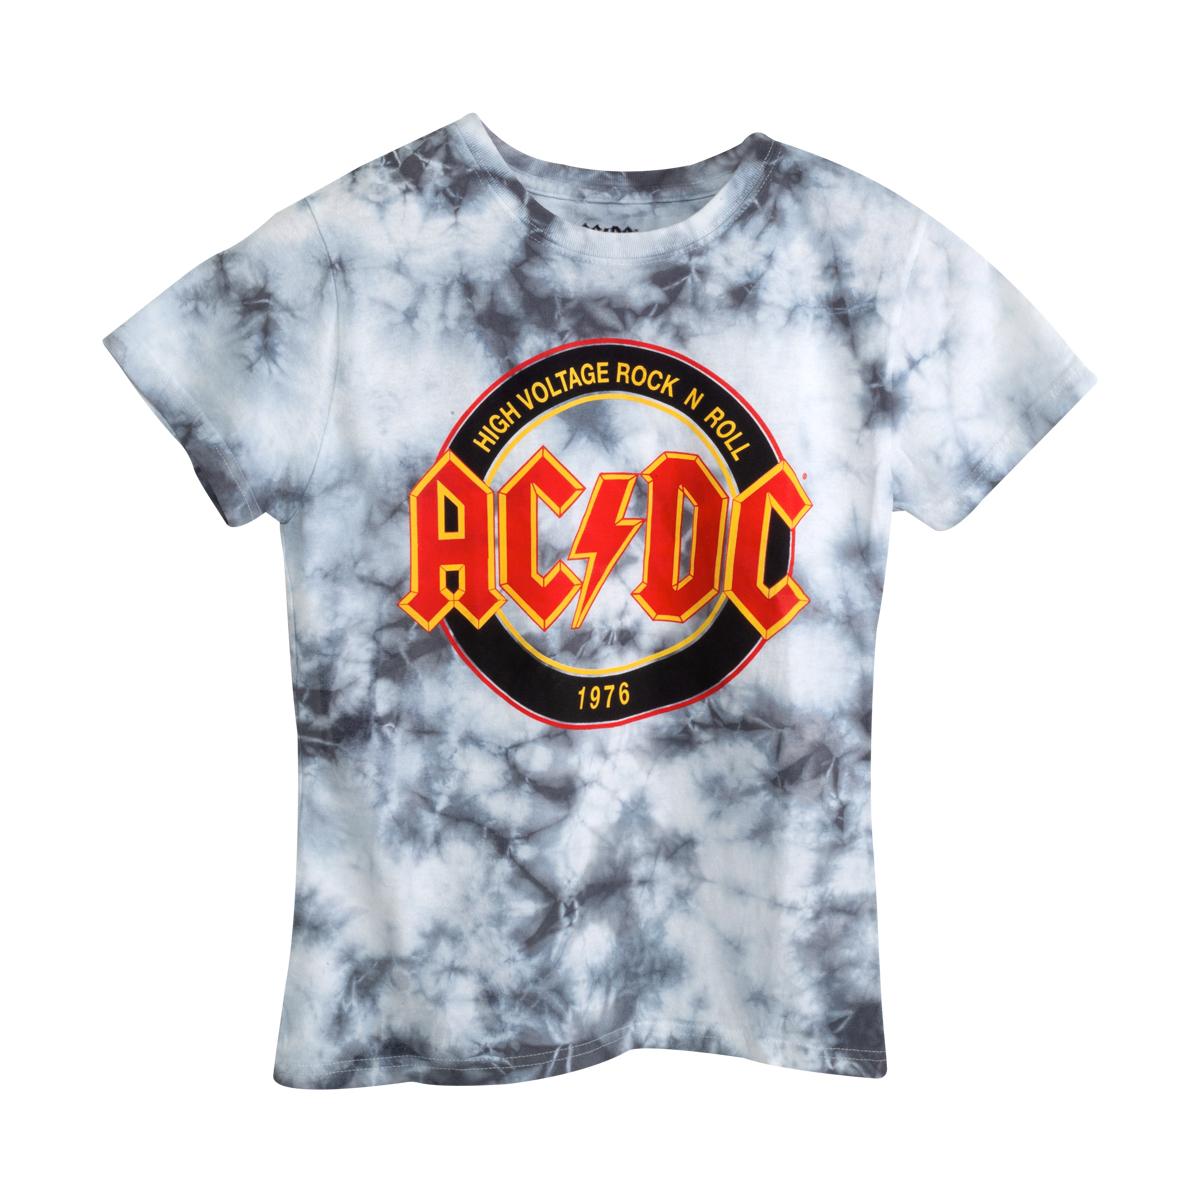 AC/DC High Voltage Rock N' Roll Circle Logo Tie-Die T-shirt